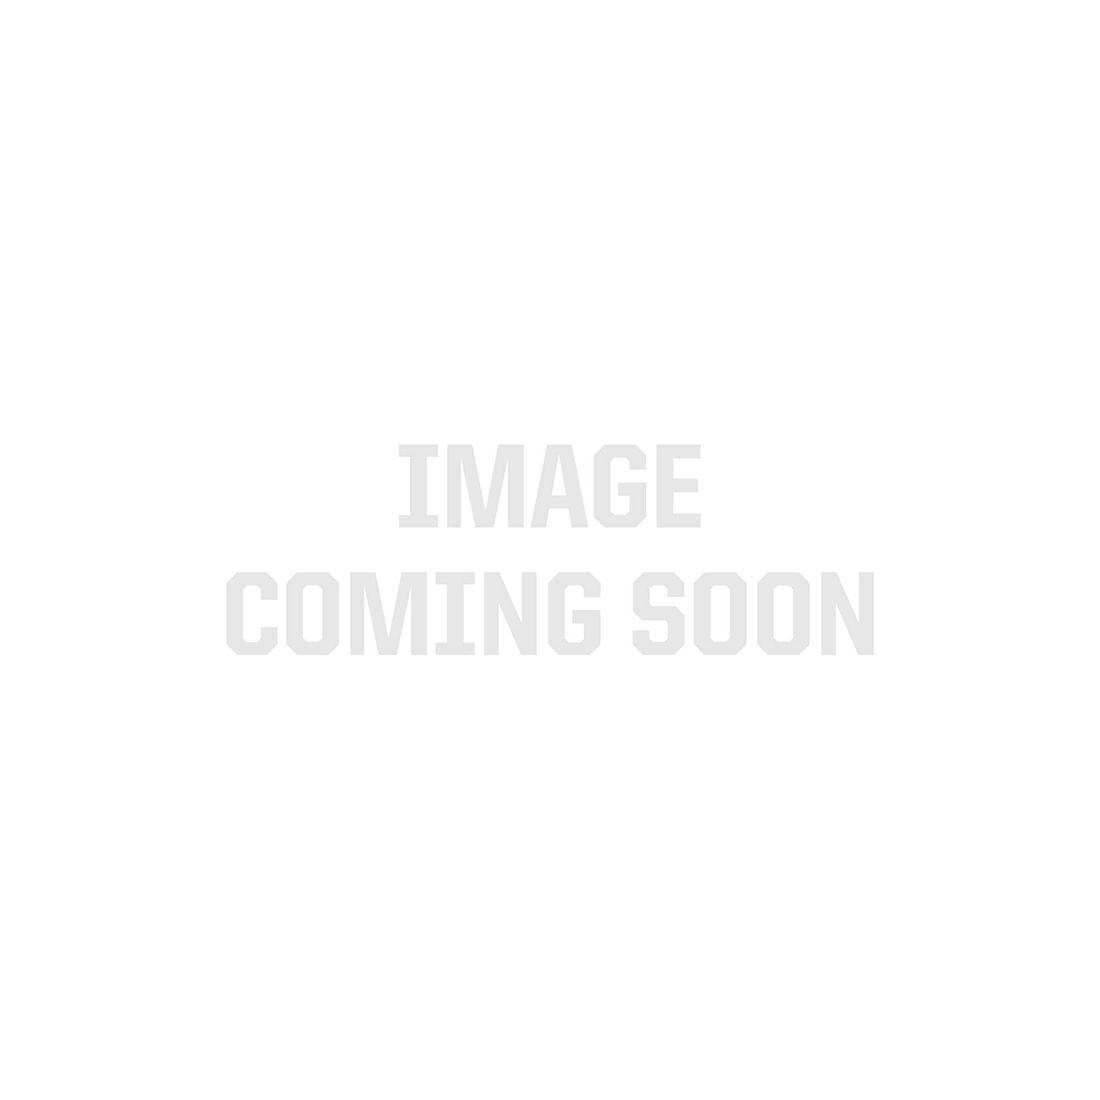 Waterproof RGBA 4-in-1 5050 CurrentControl LED Strip Light, 60/m, 12mm wide, Sample Kit